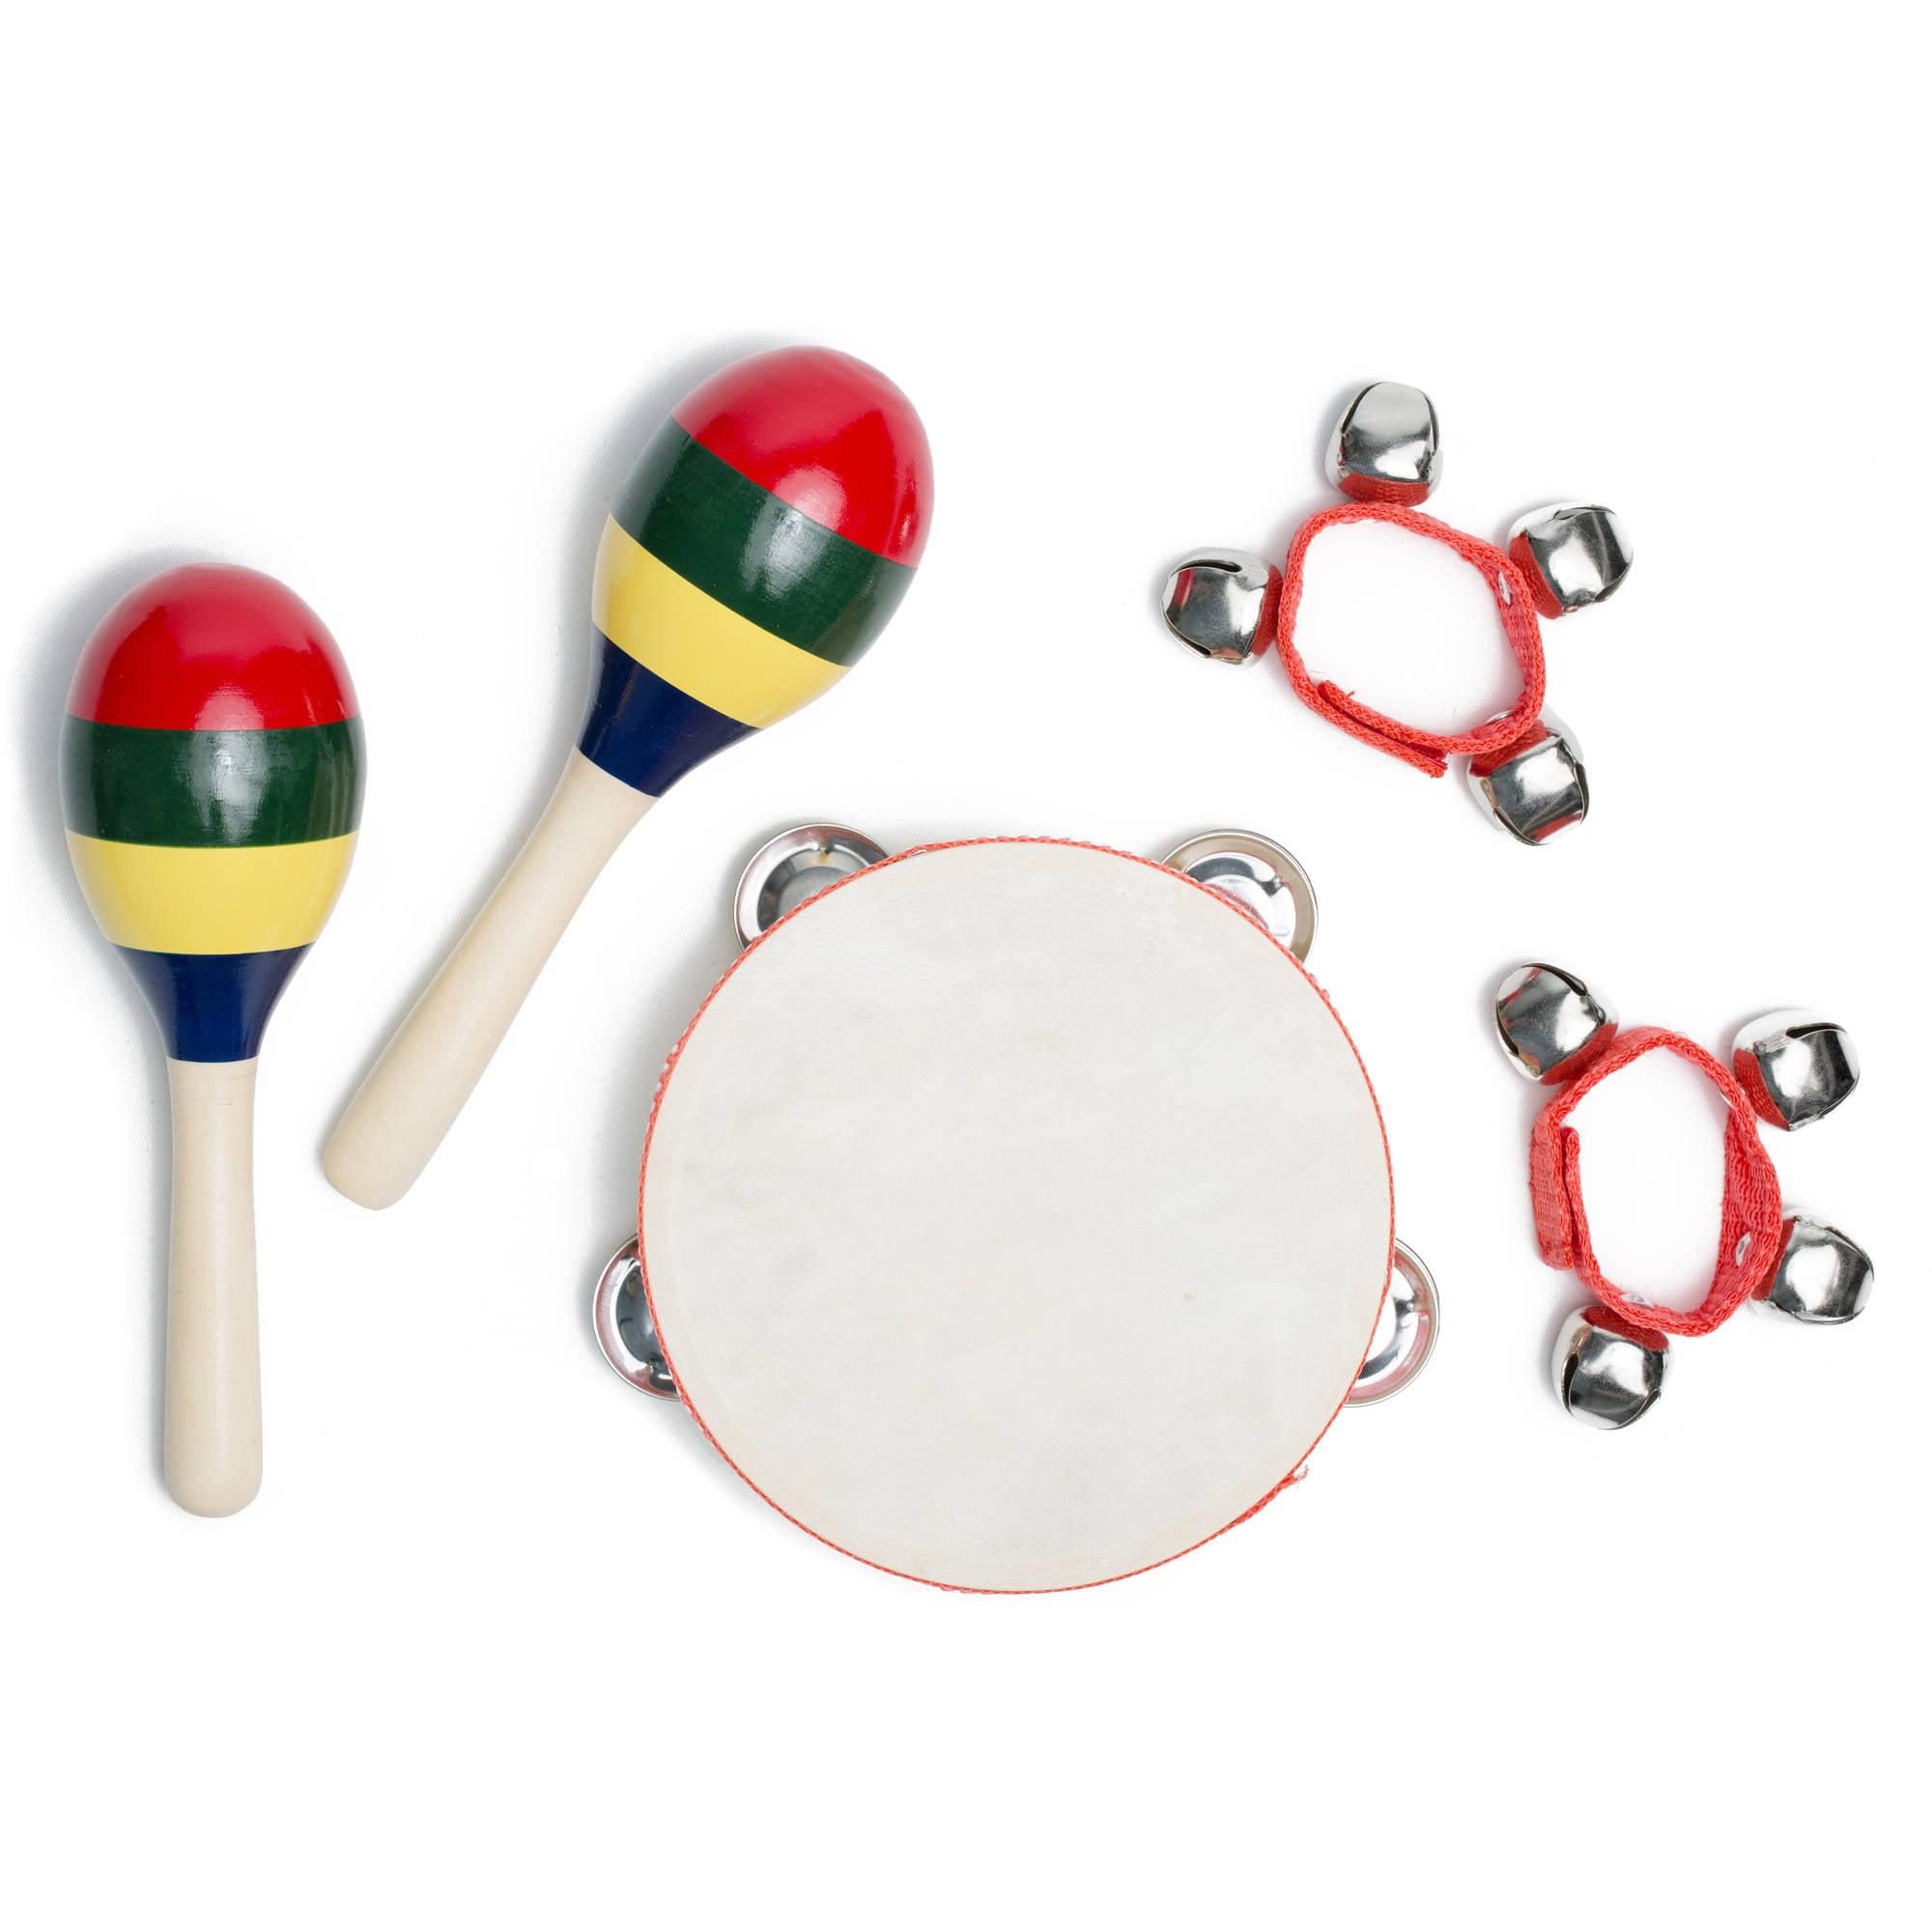 Kayata Kids Percussion Set includes Pair of Maracas, Wrist Bell and Tone Block